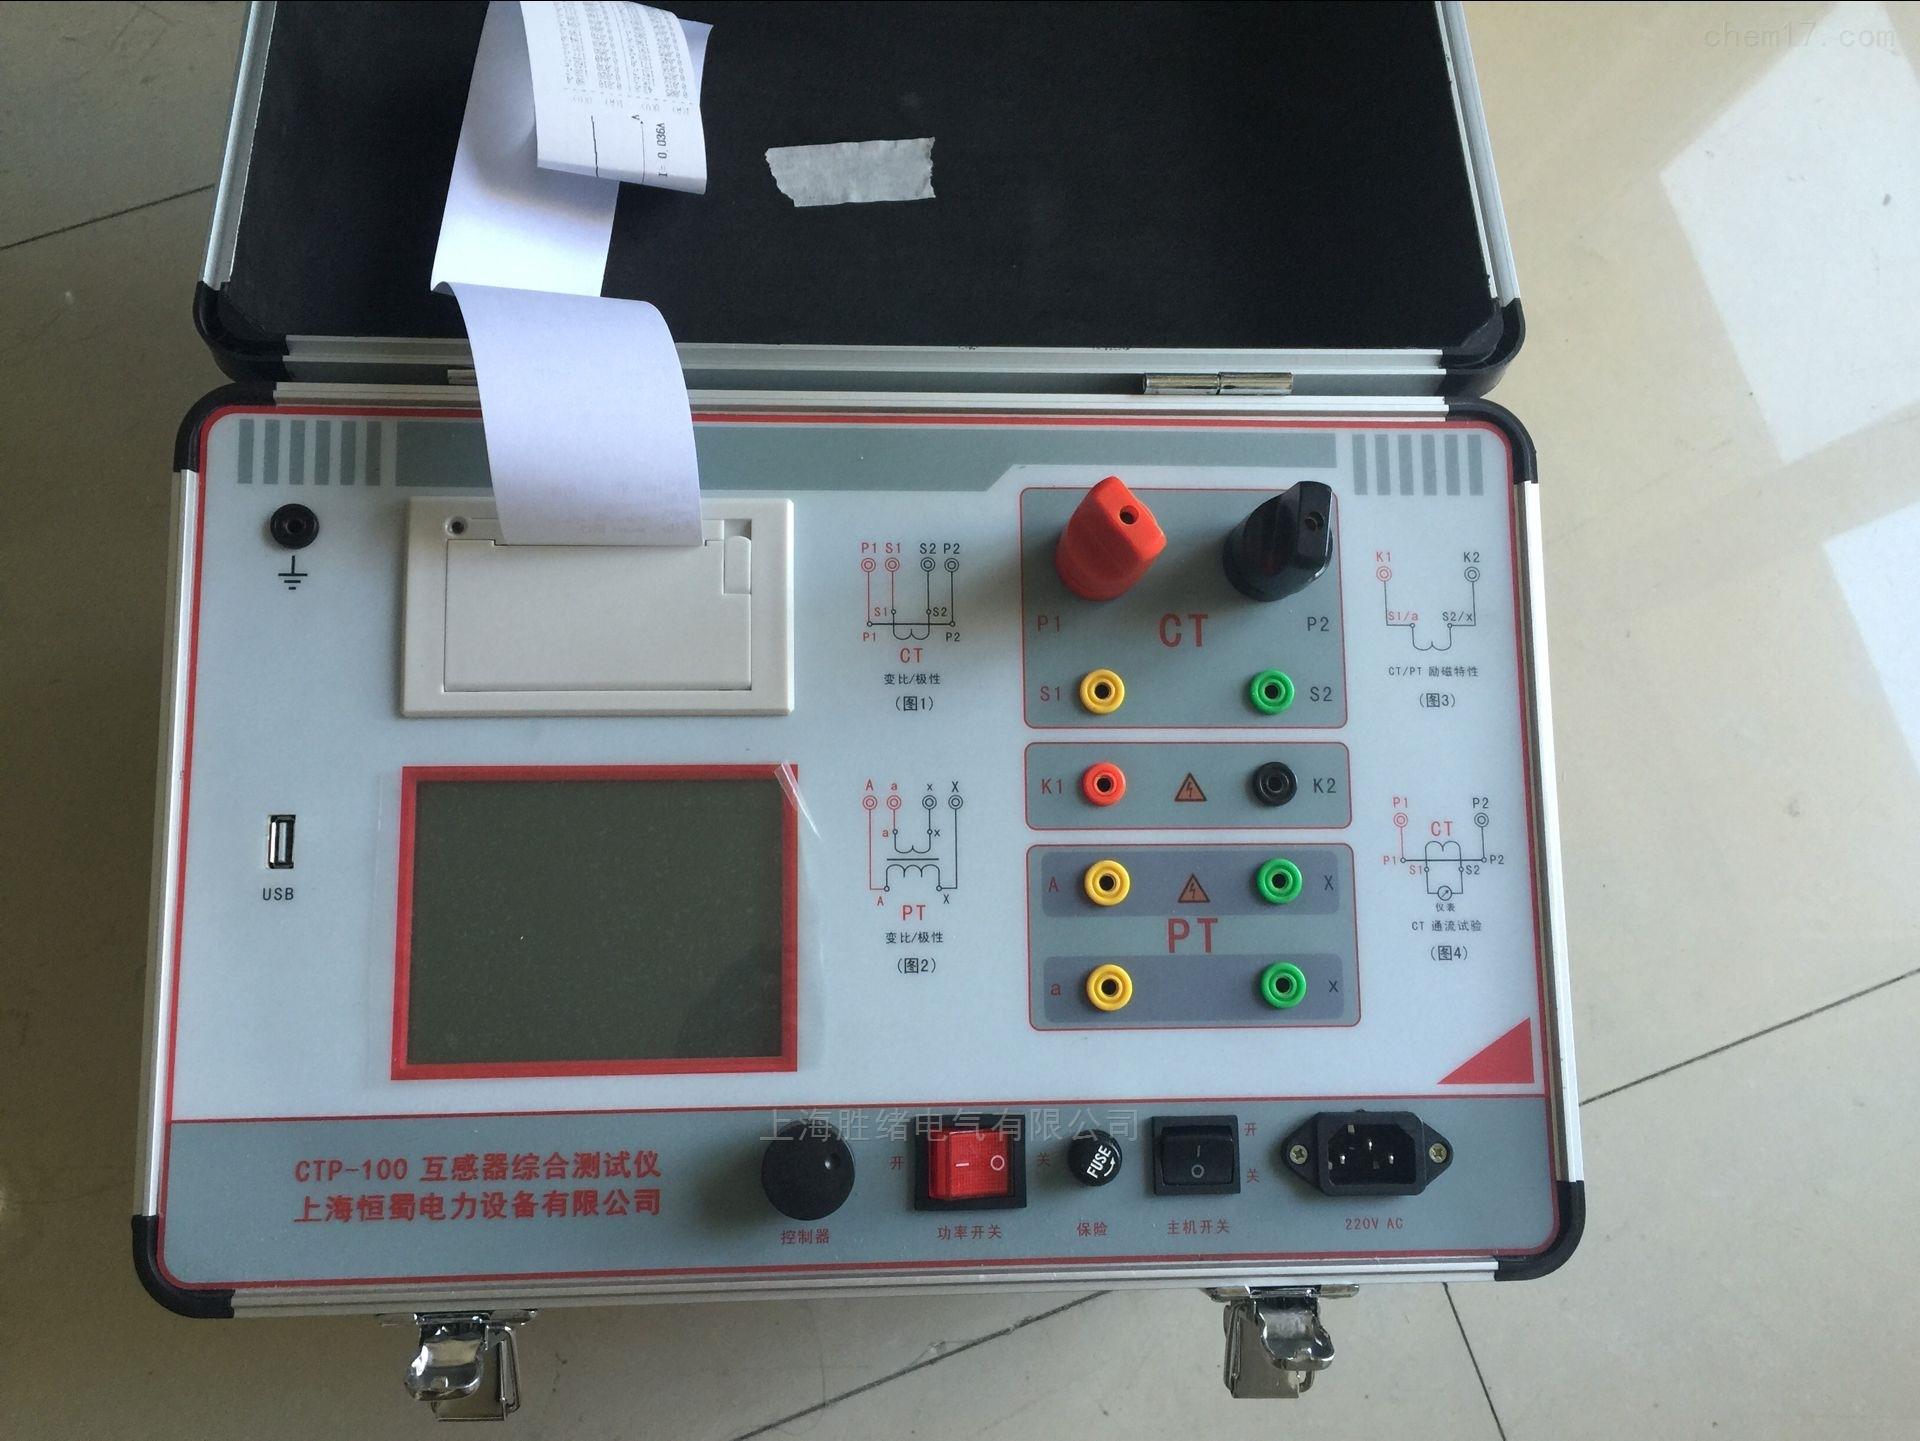 CTP-100P 变频式互感器综合测试仪